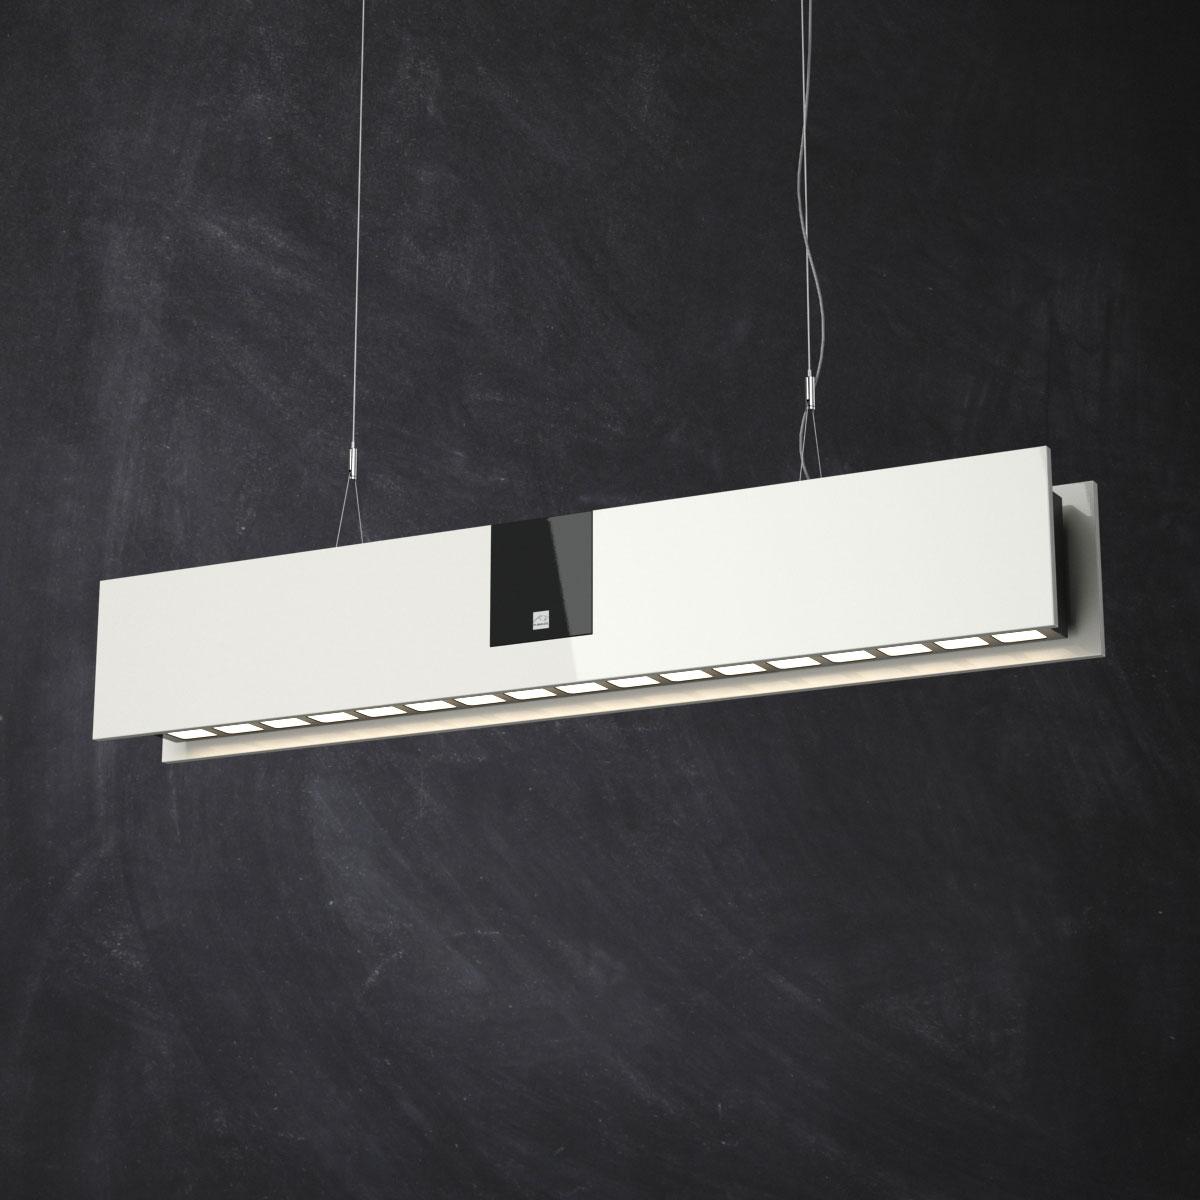 lamp 37 AM152